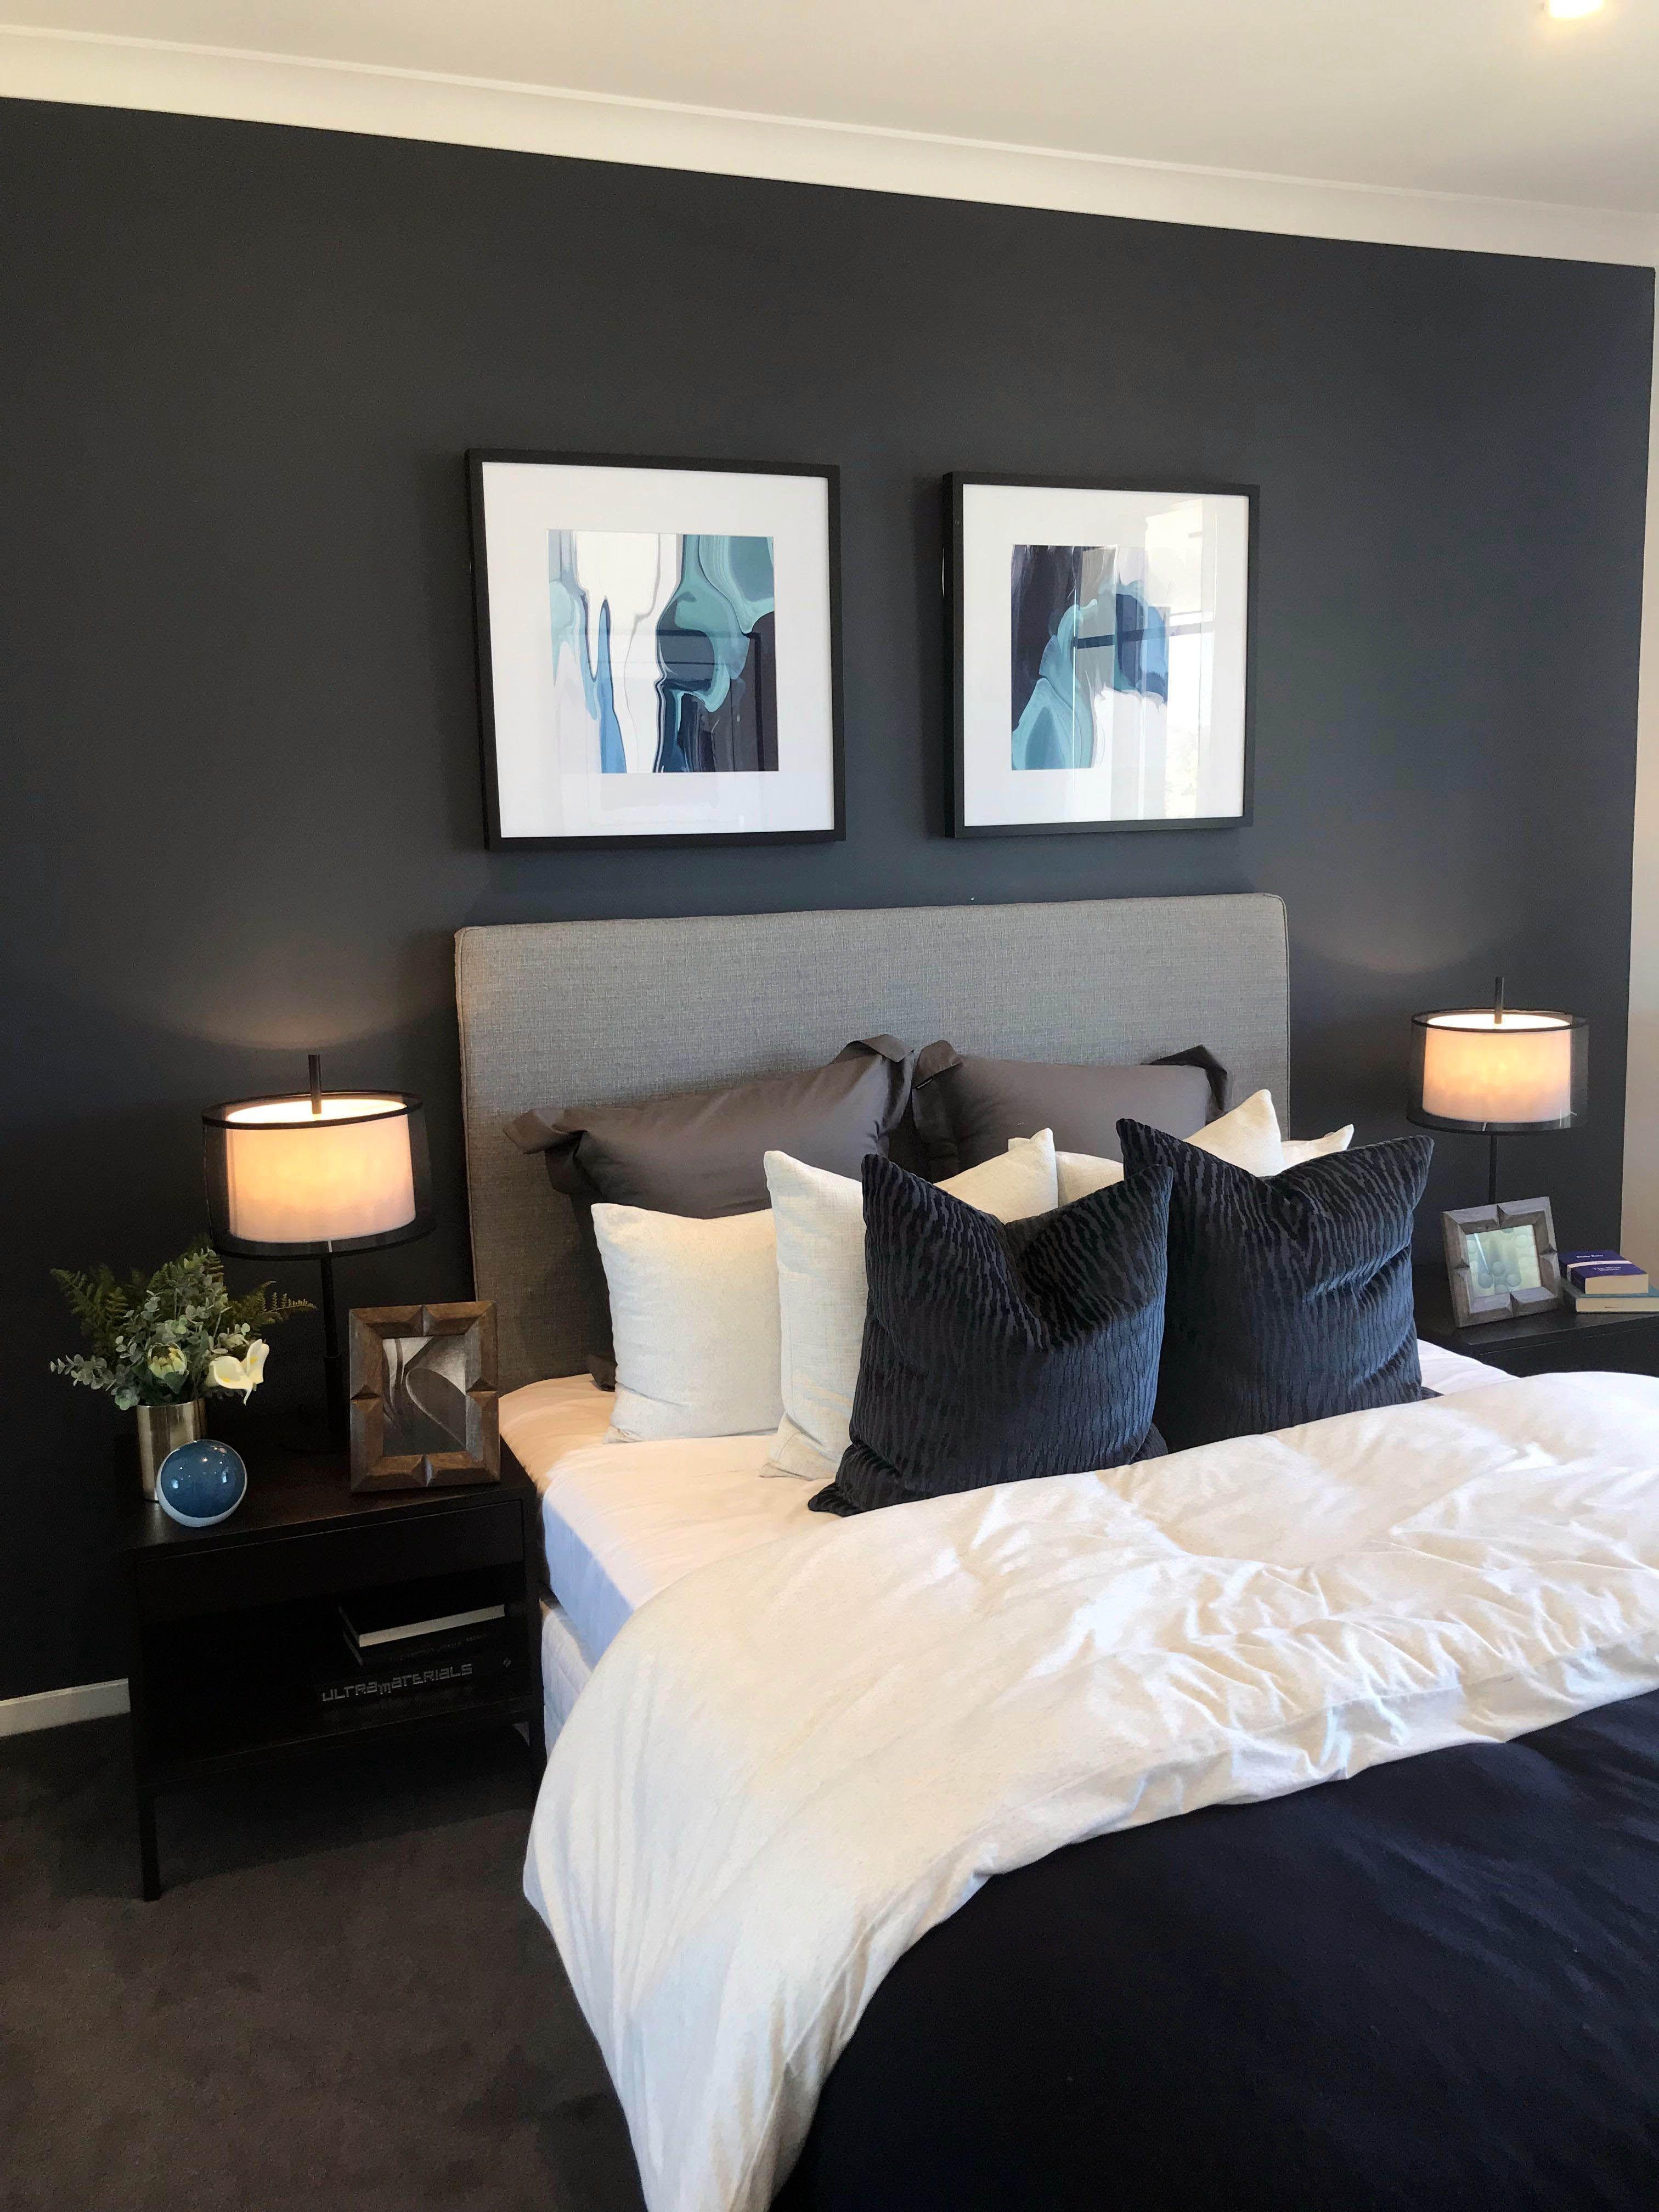 Good Hgtv Bedroom Paint Ideas Only In Smart Homefi Design Gray